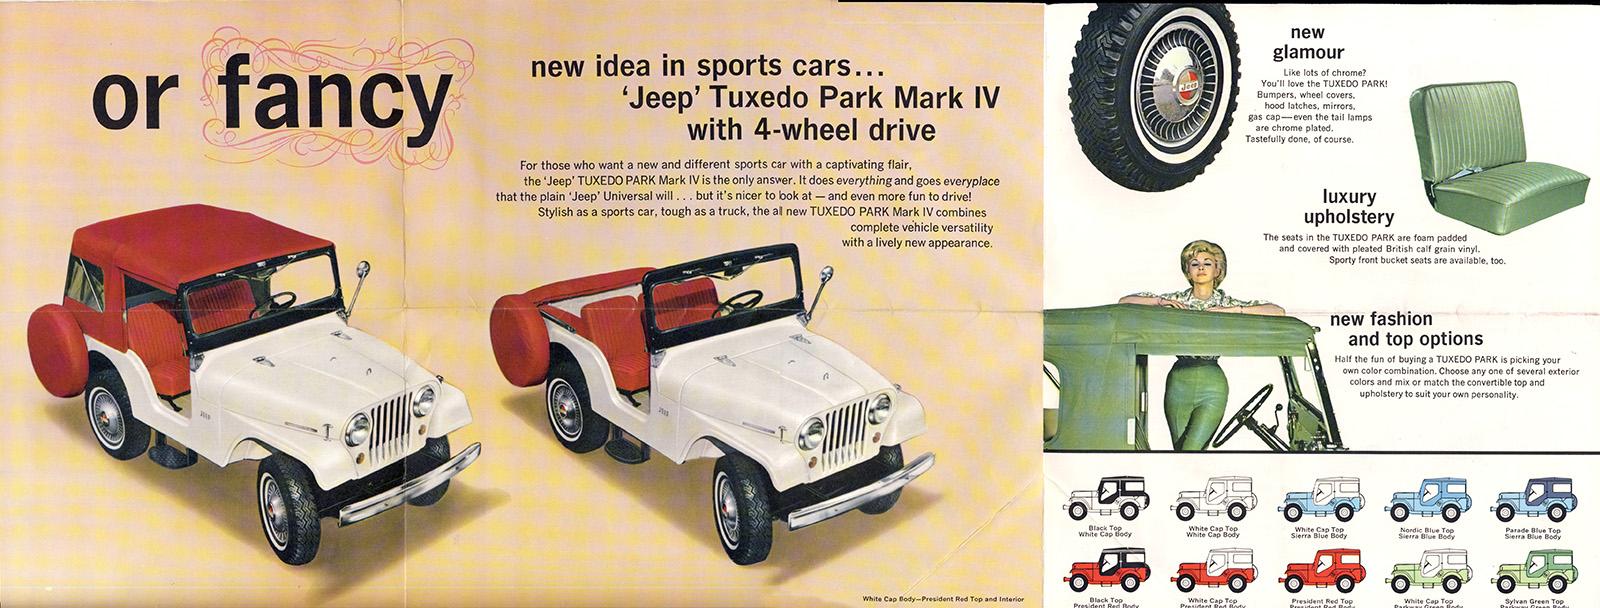 hight resolution of 1964 06 cj5 tuxpark brochure lores1